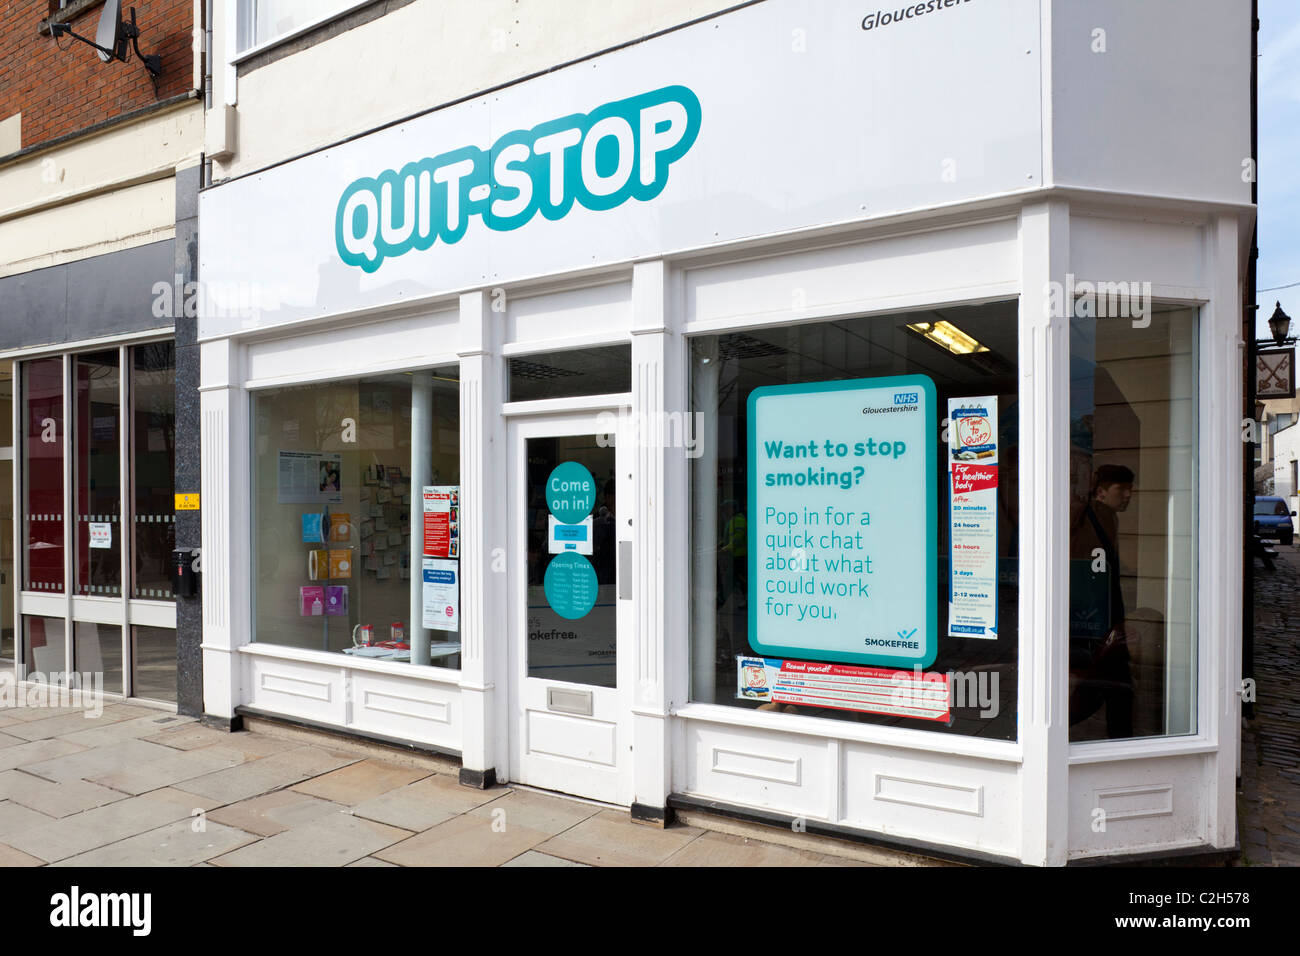 Quit Stop Smoking Cessation Information shop in Gloucester - Stock Image